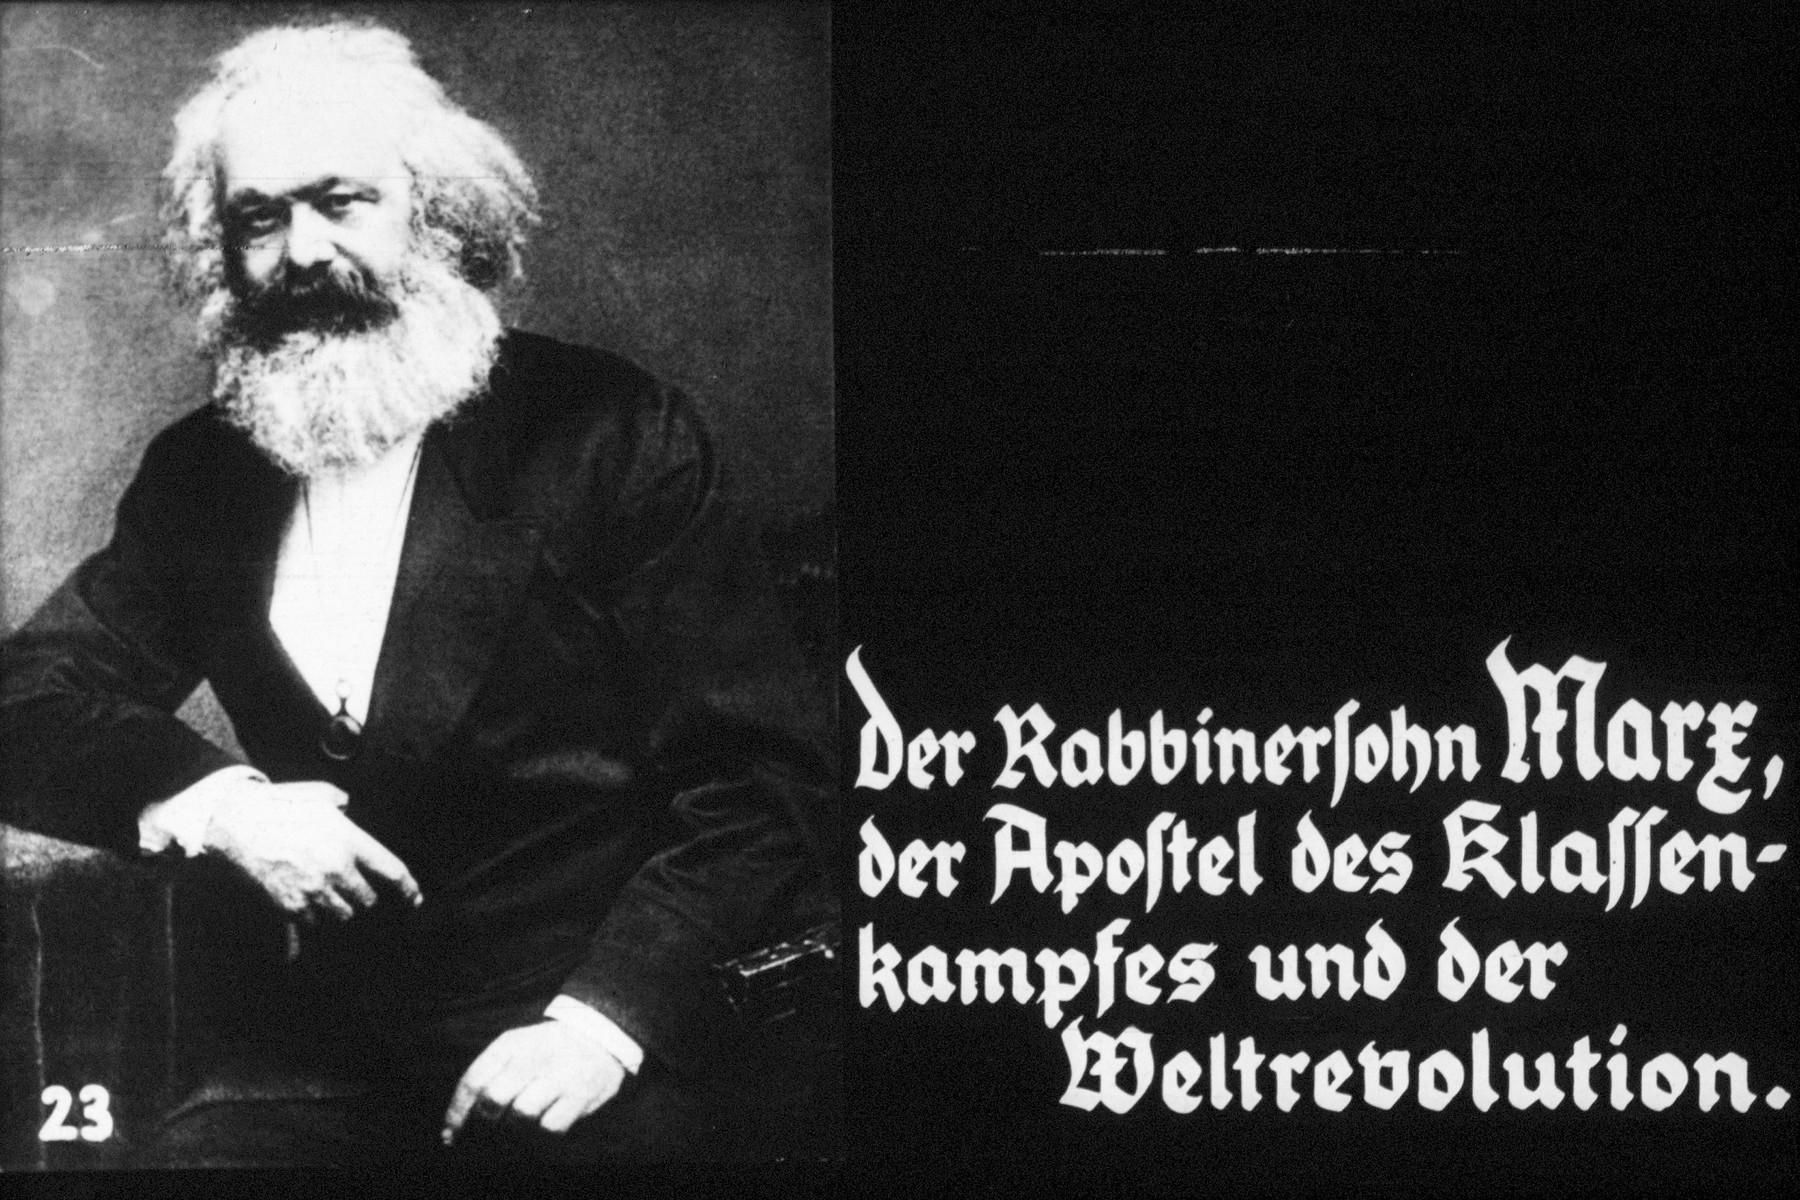 "23rd Nazi propaganda slide of a Hitler Youth educational presentation entitled ""Germany Overcomes Jewry."" der Rabbinersohn Marz, der Apostel des klassenkampfes und der Weltrevolution // the rabbi's son Marx, the apostle of the class struggle and world revolution"